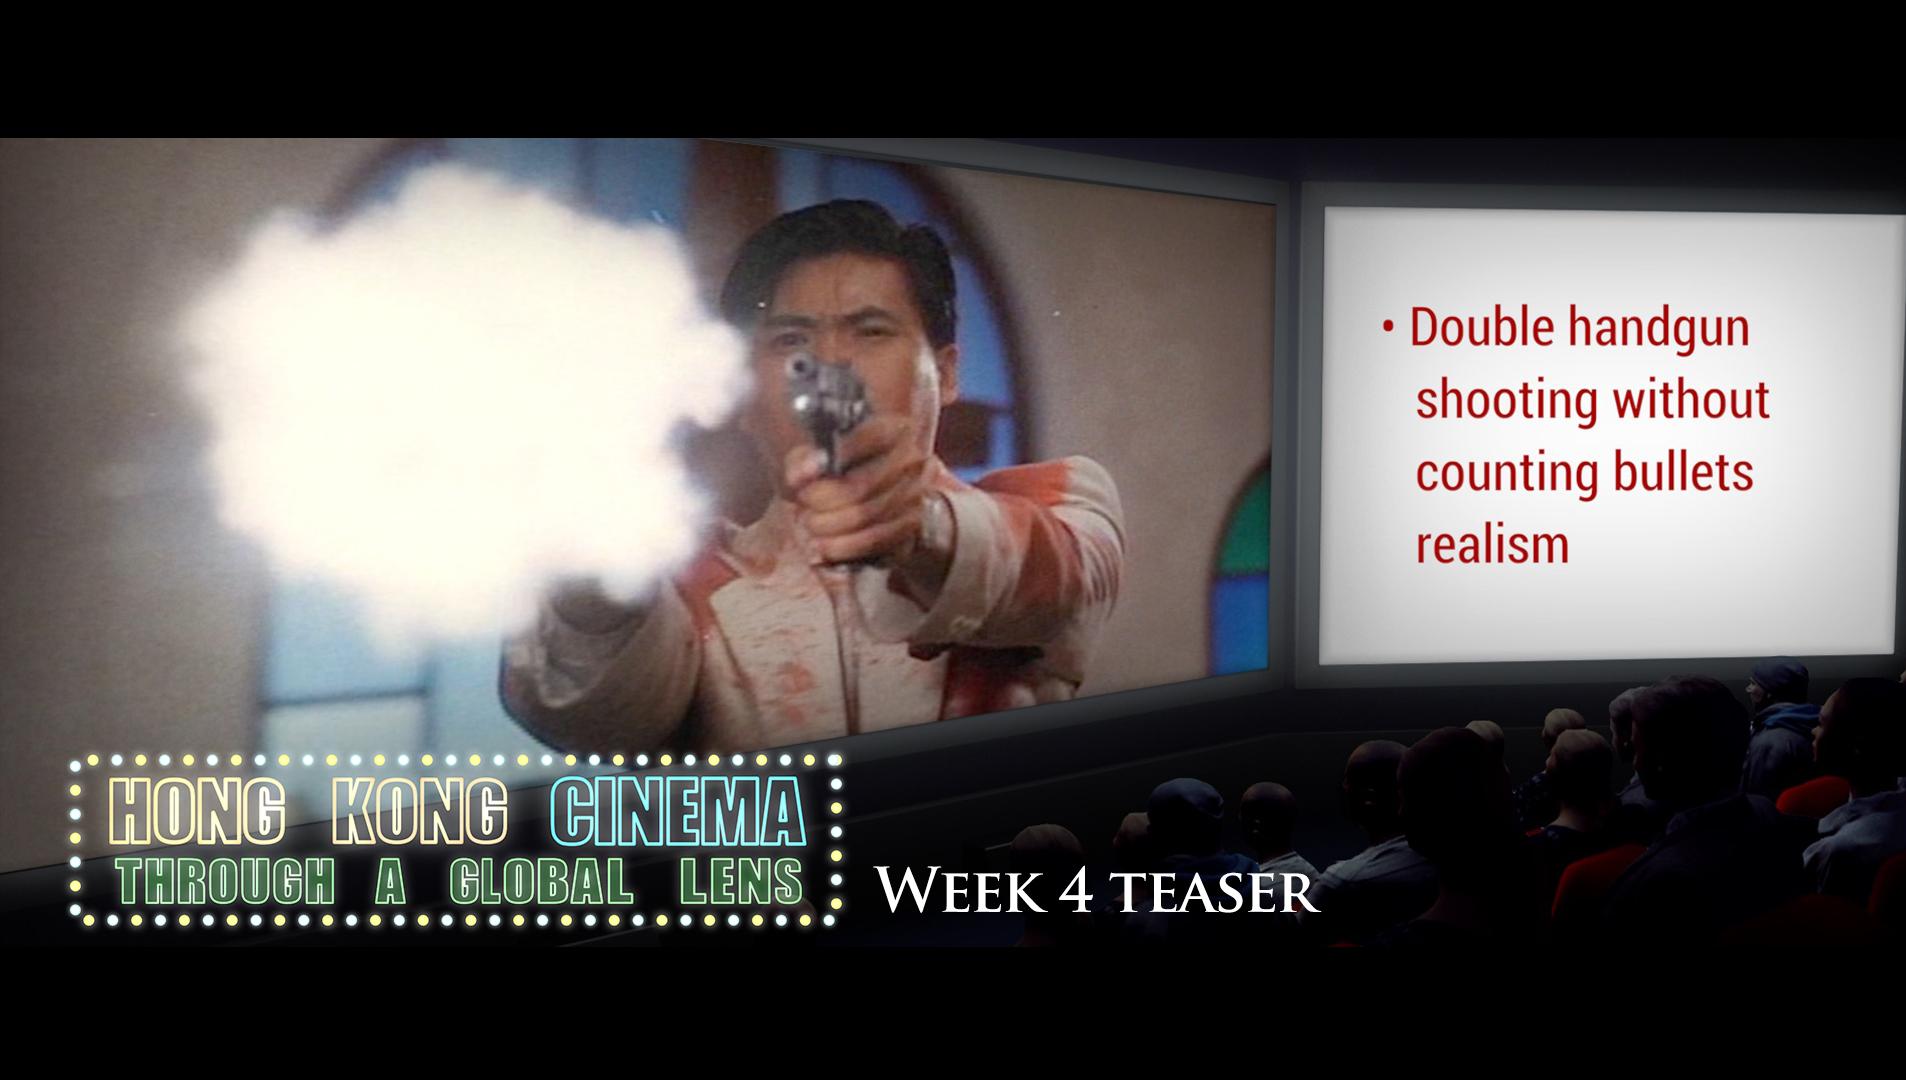 Week 4 Teaser